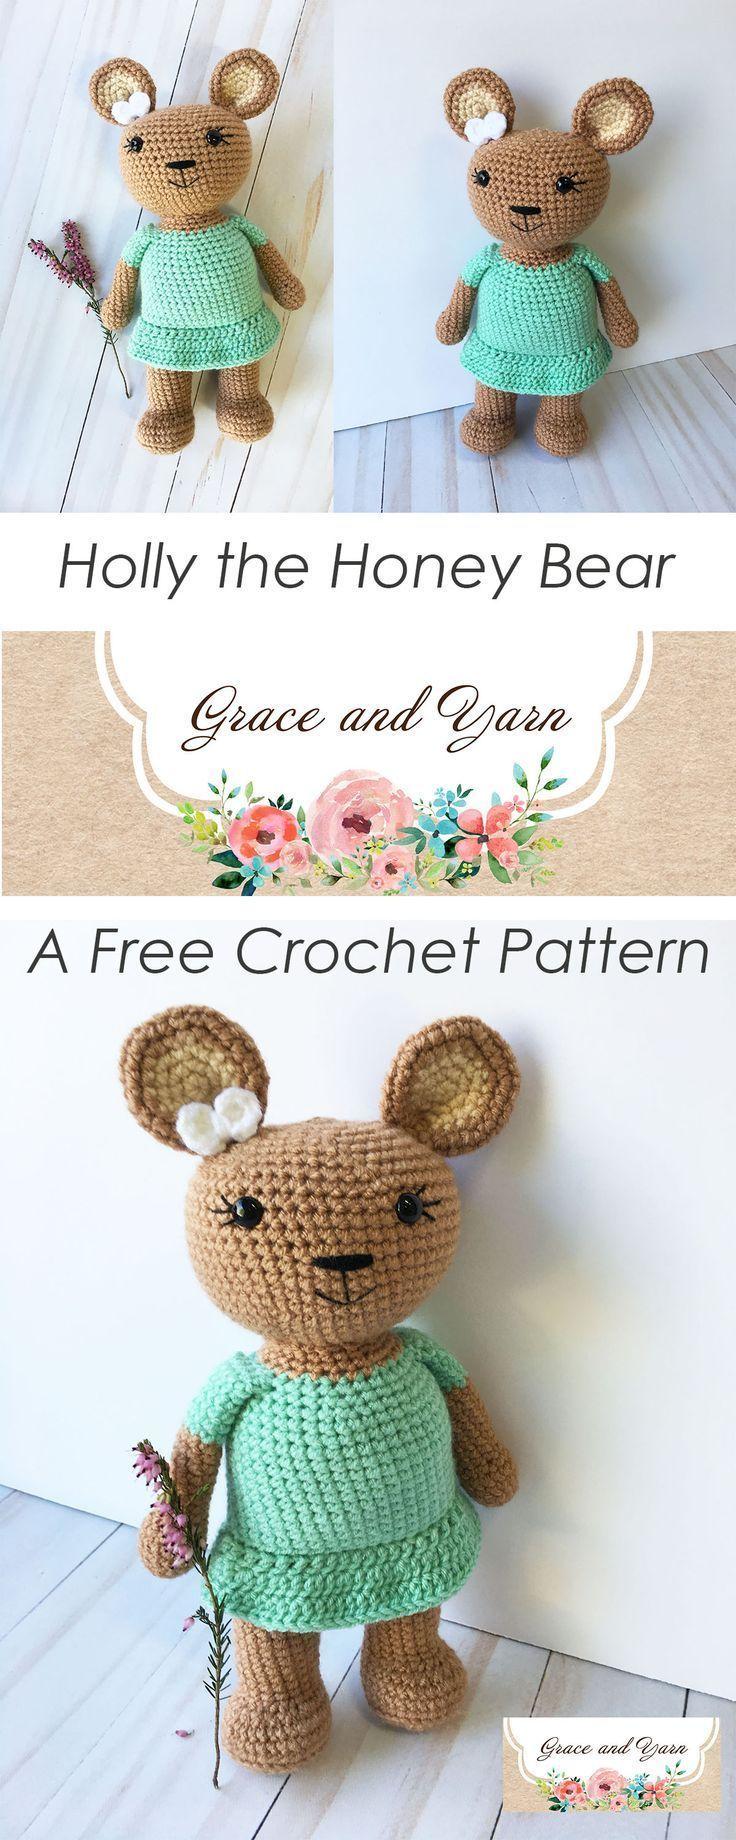 Holly the Honey Bear- A Free Crochet Pattern   Macik   Pinterest ...